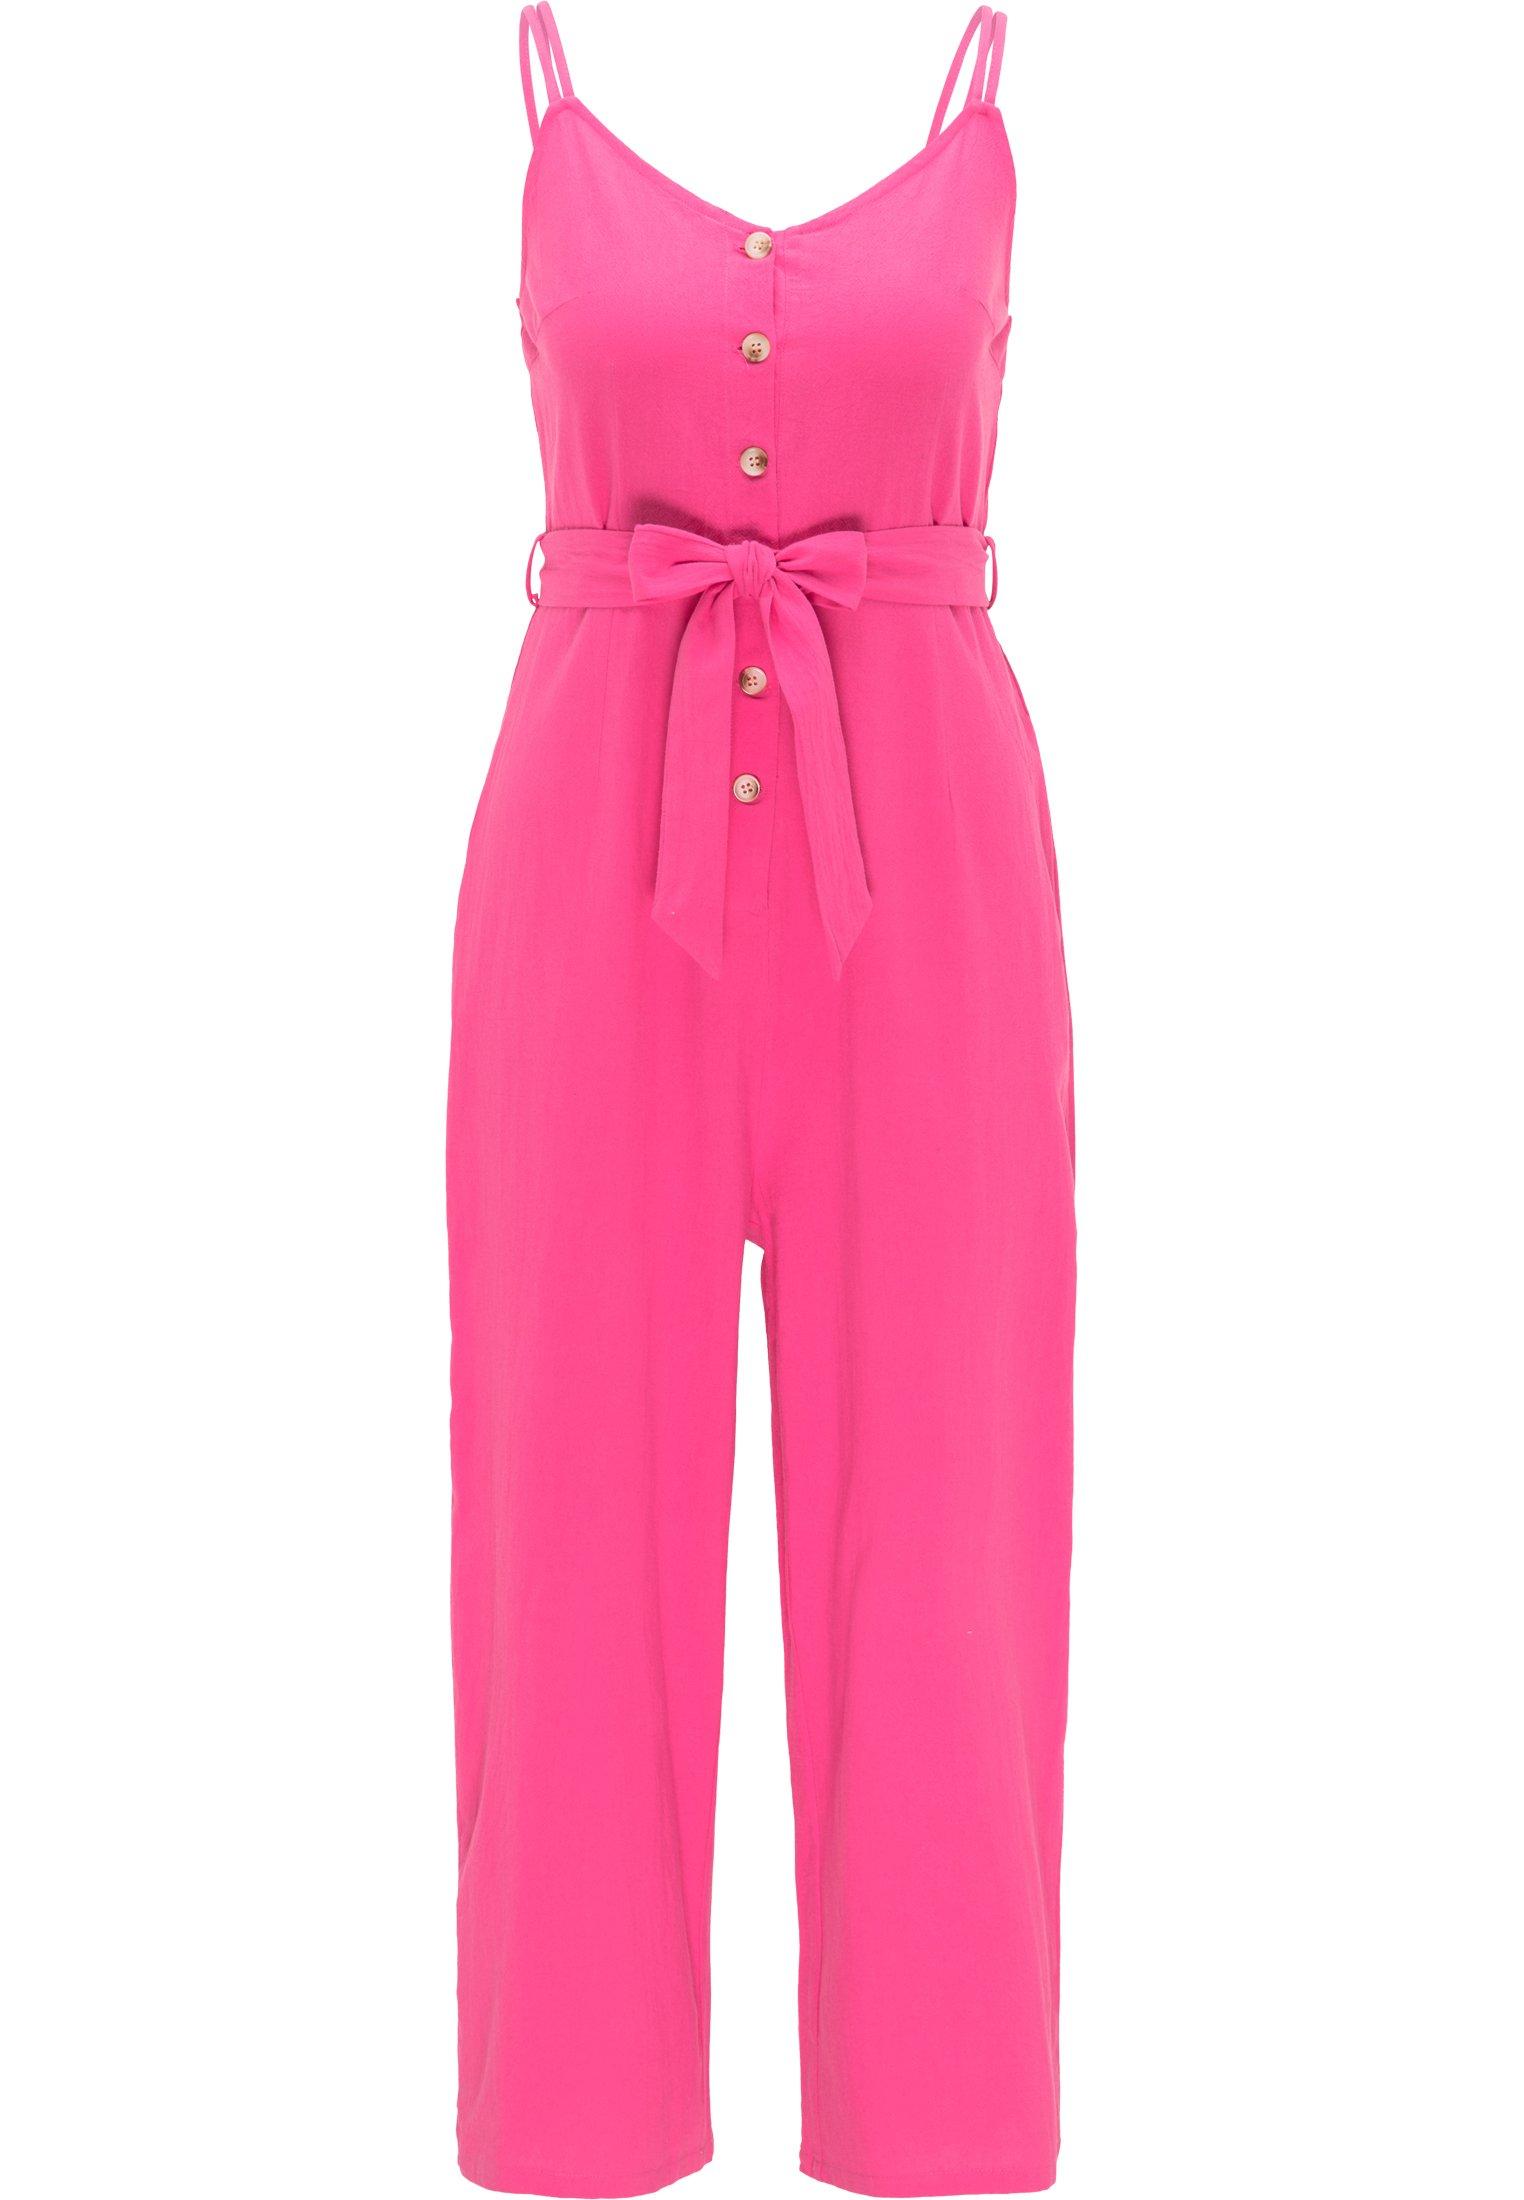 UGG KARI Ciabattine pink dawn Zalando.it